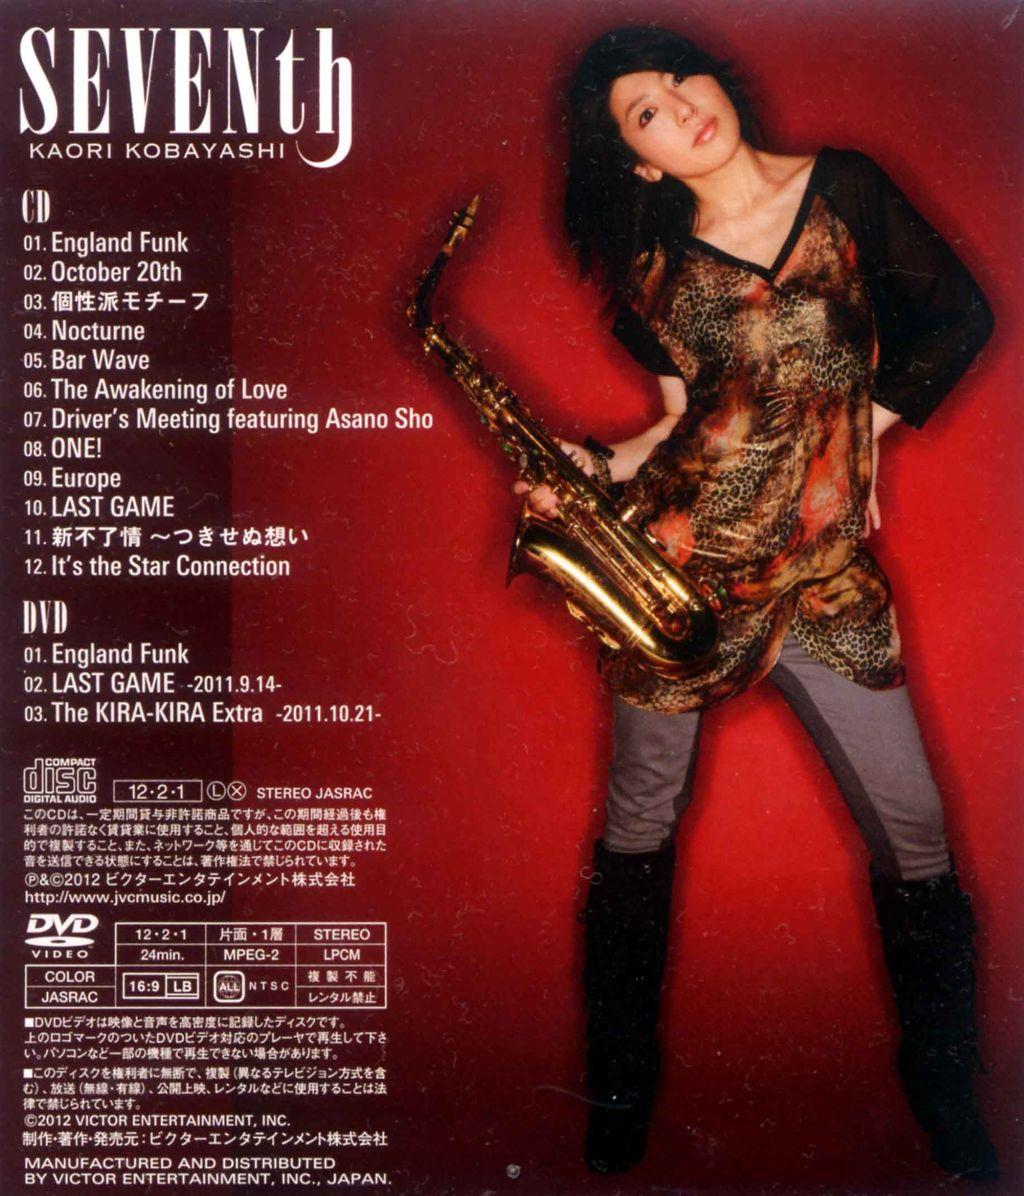 SEVENth-2